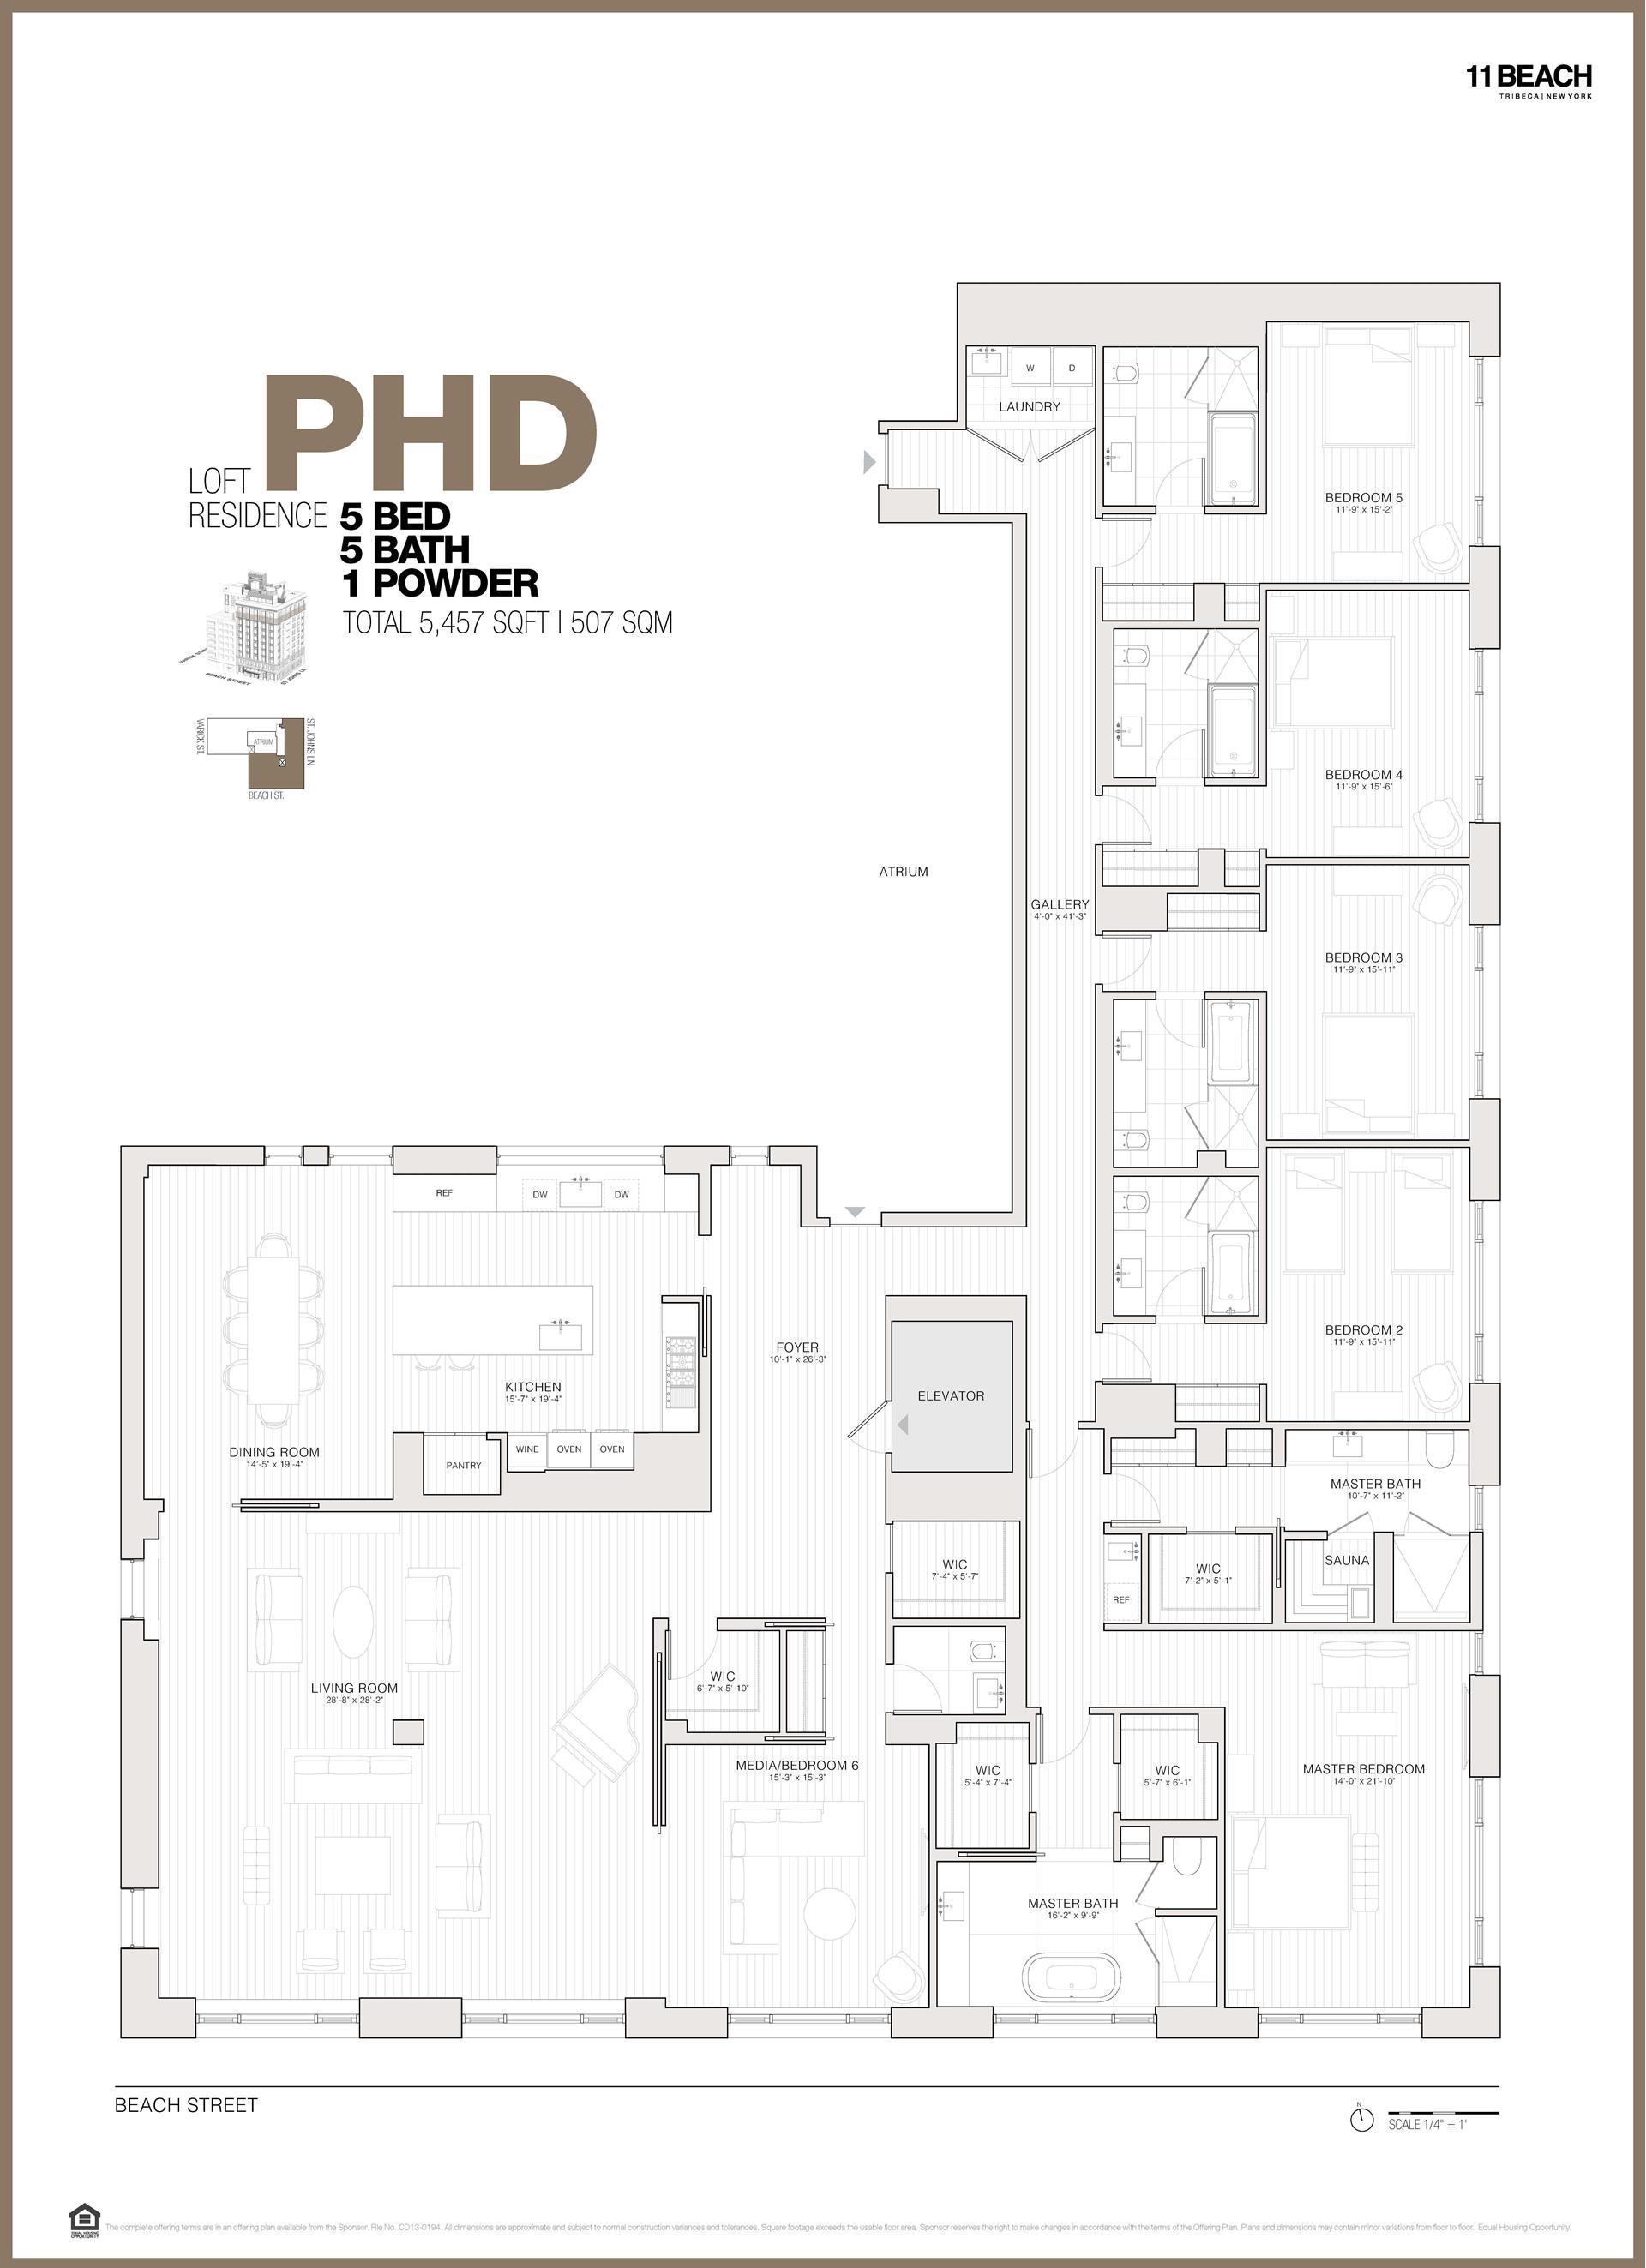 Floor plan of 11 Beach St, PHD - TriBeCa, New York